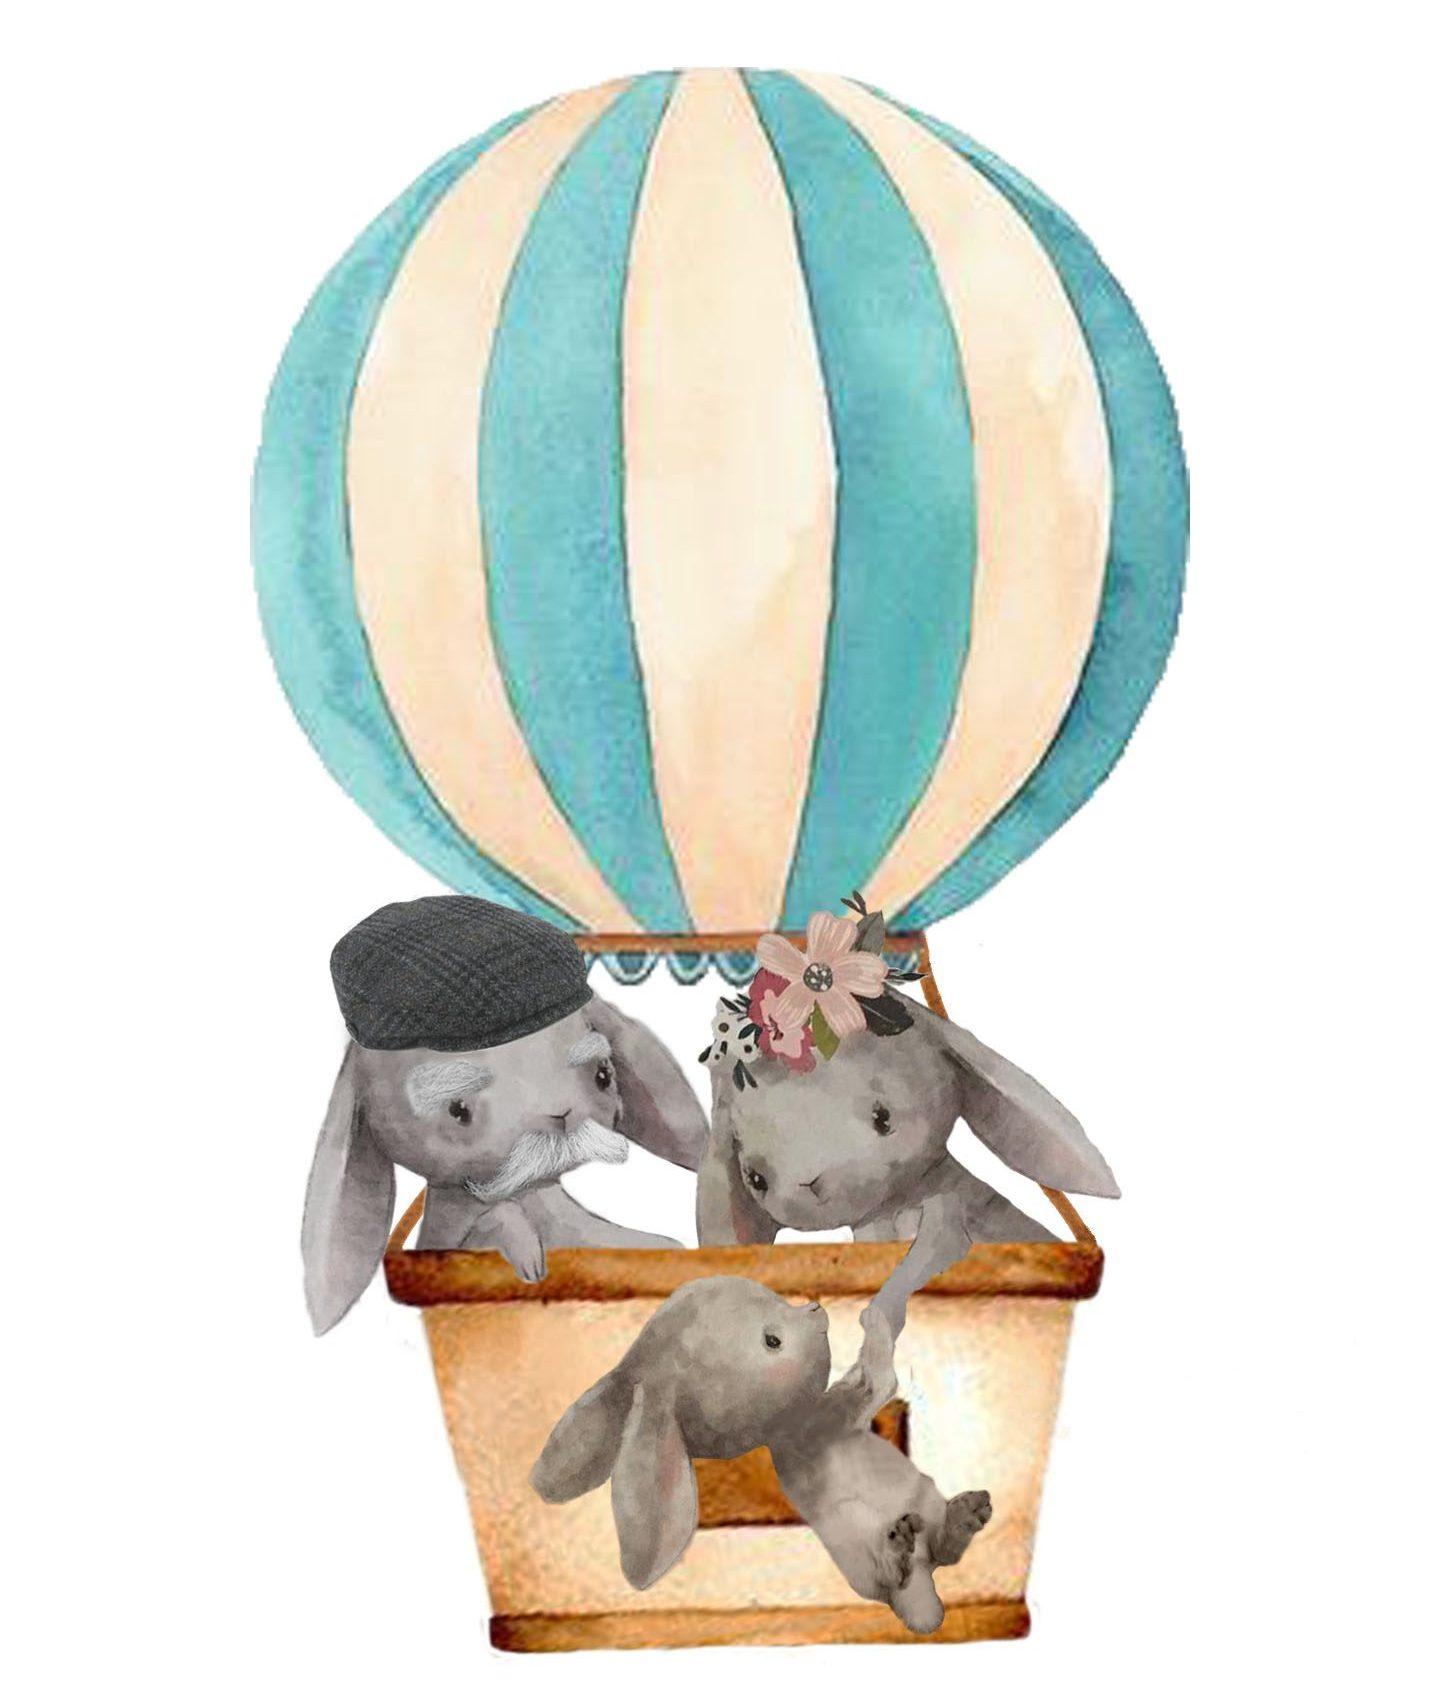 Logopediepraktijk De Taalballon